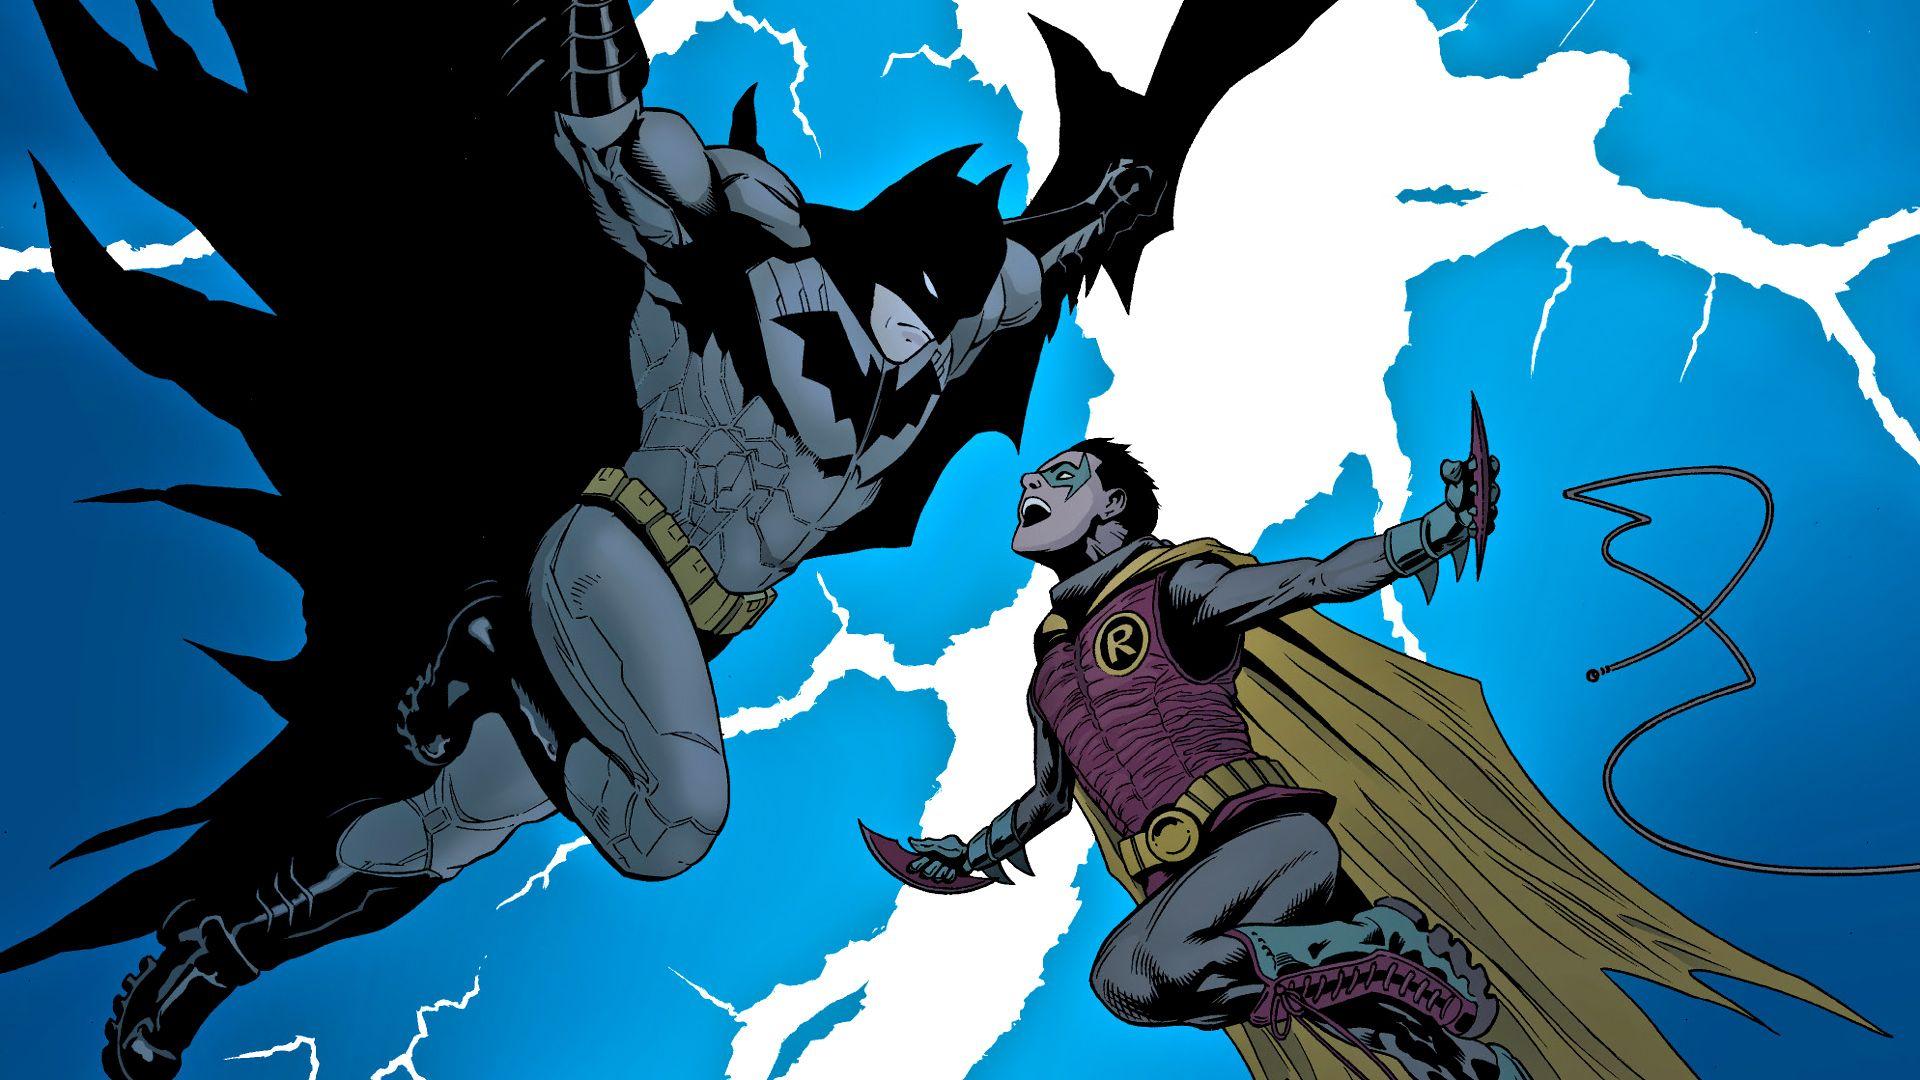 Pin By Affiong Henry On Robins Nightwing Batgirls Others Batman And Robin Wallpaper Batman Batman Comics